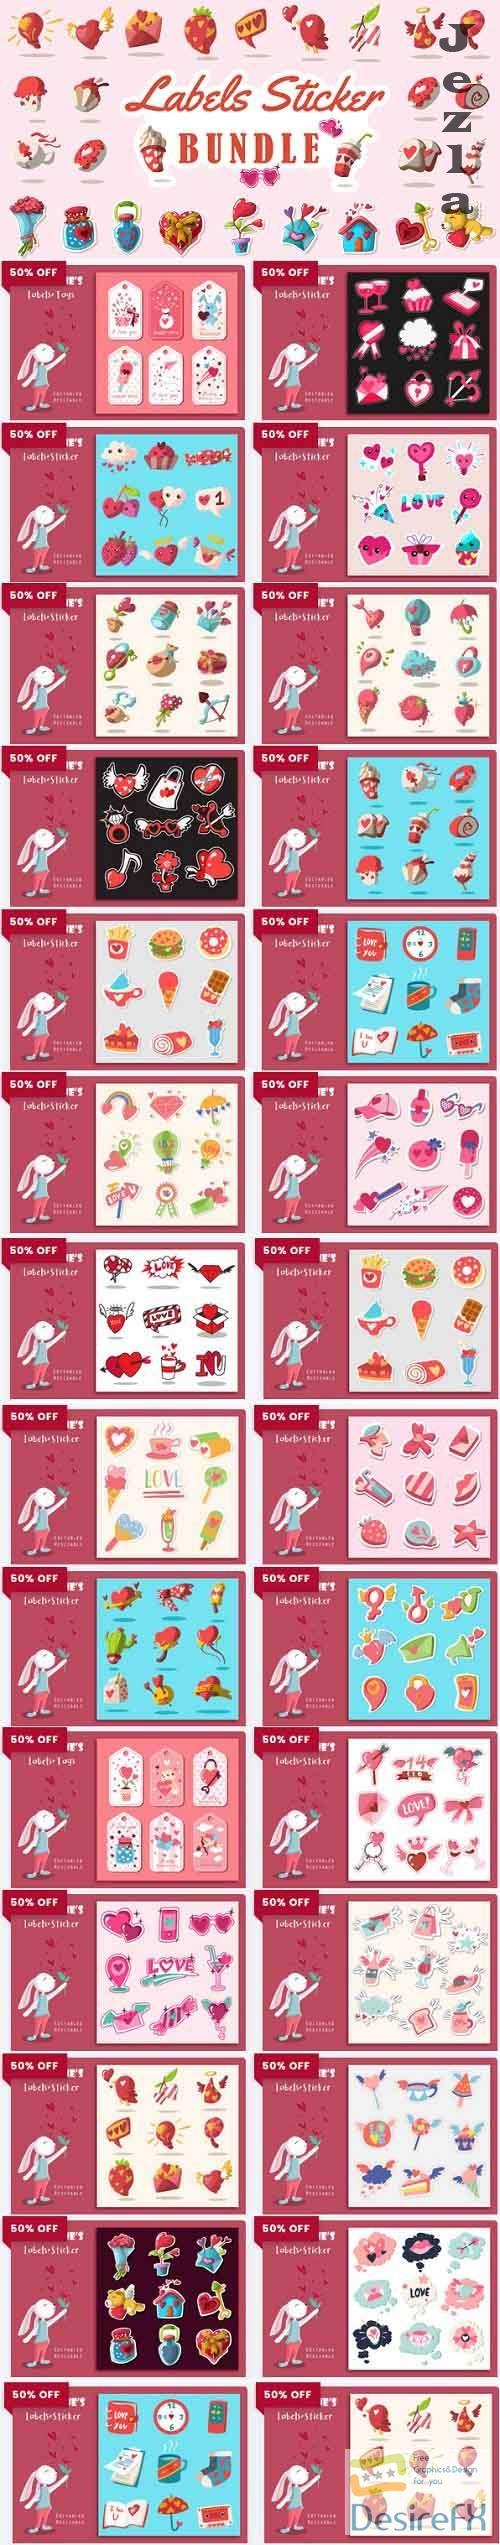 Valentine's Labels Sticker Bundle -  25 Premium Graphics